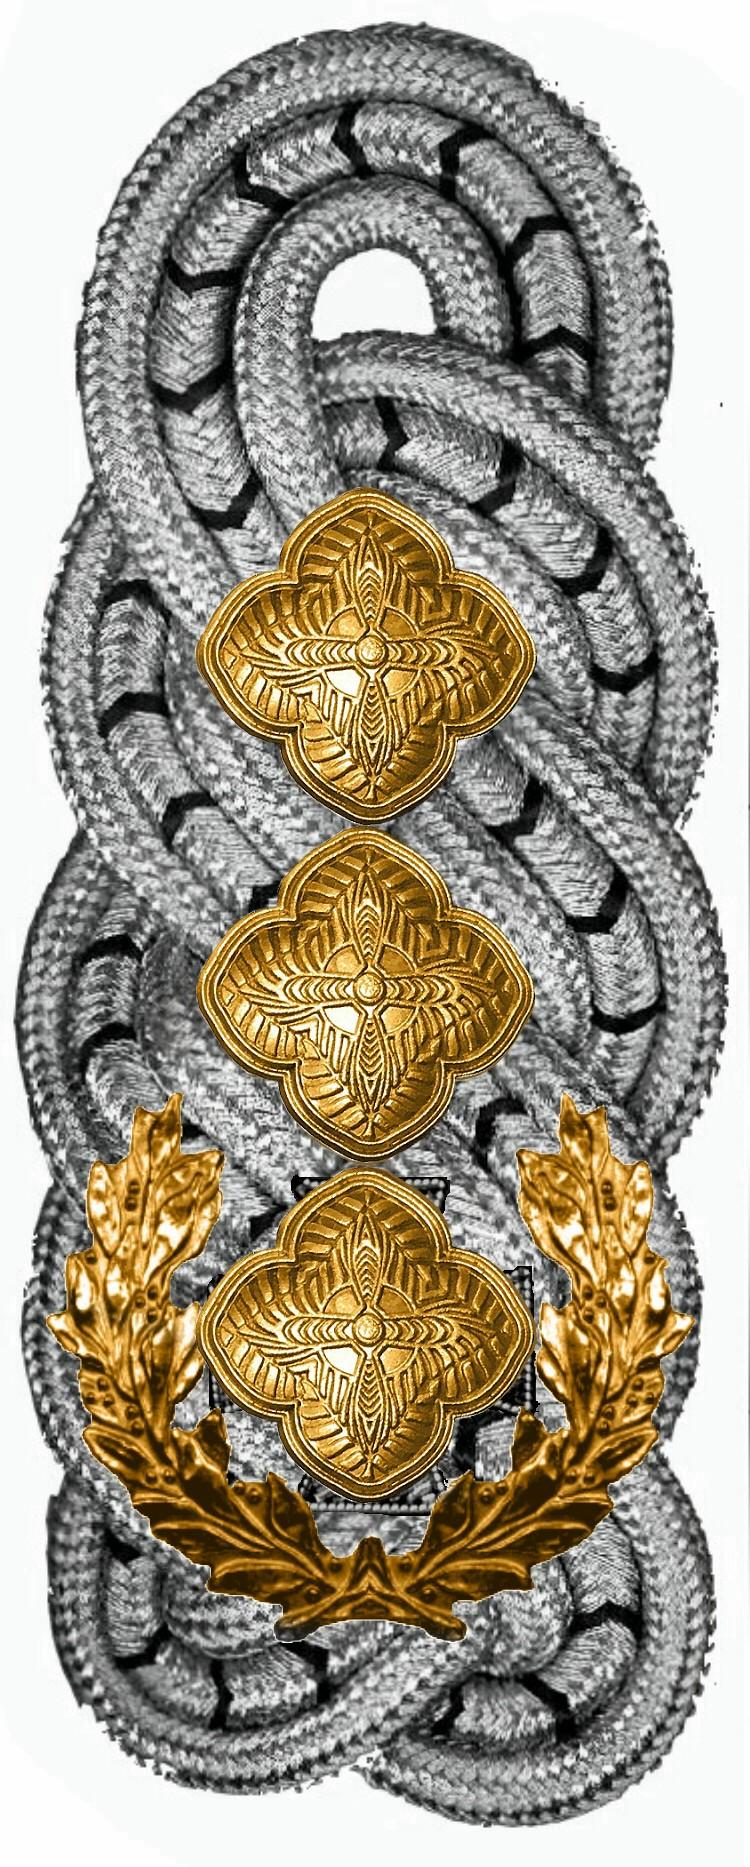 gala-1st-sergeant-major-lu